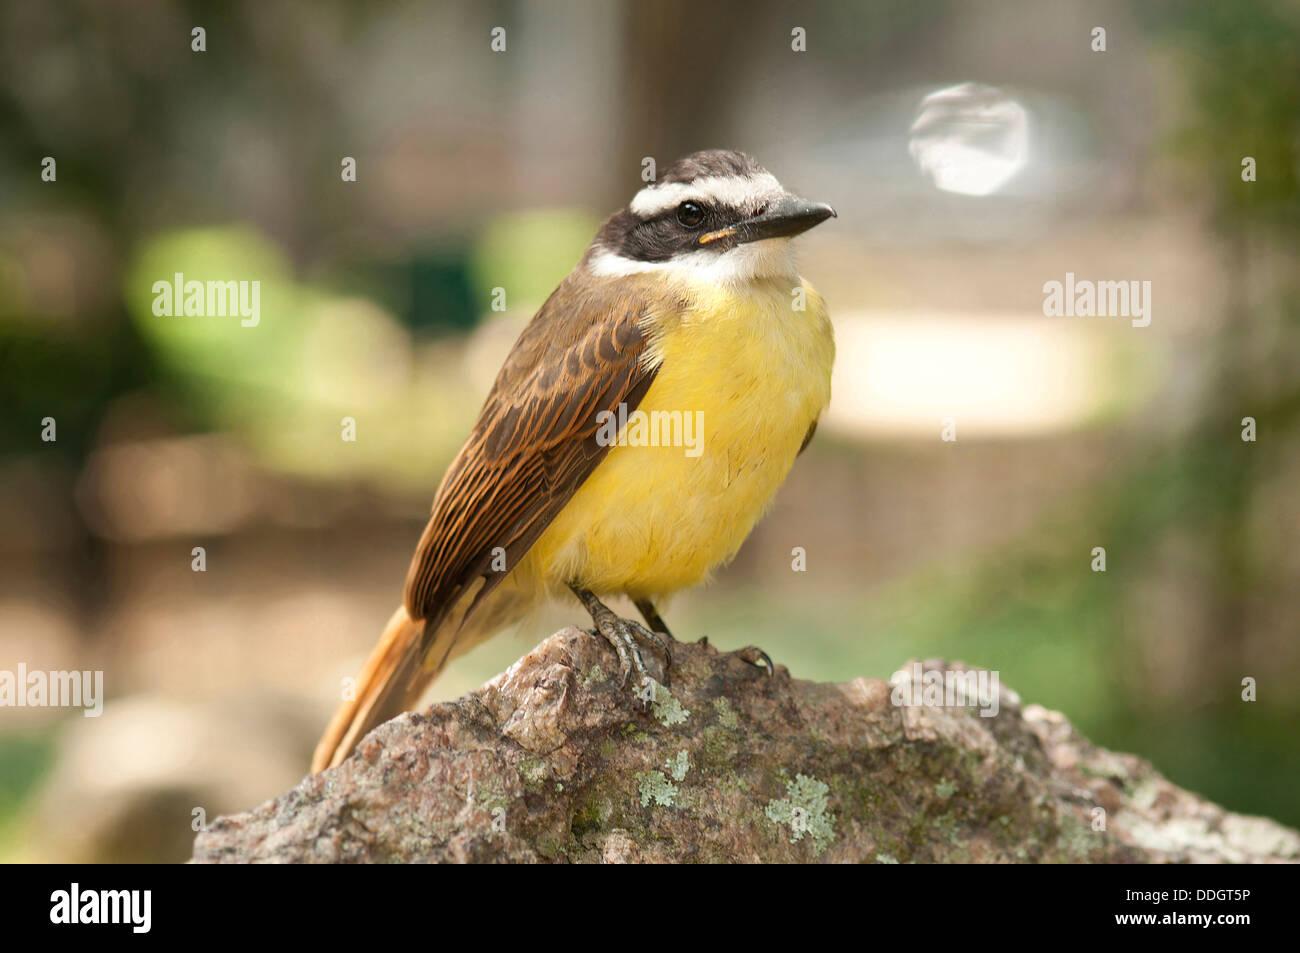 The Great Kiskadee (Pitangus sulphuratus) is a passerine bird. It is a large tyrant flycatcher; sometimes its genus - Stock Image